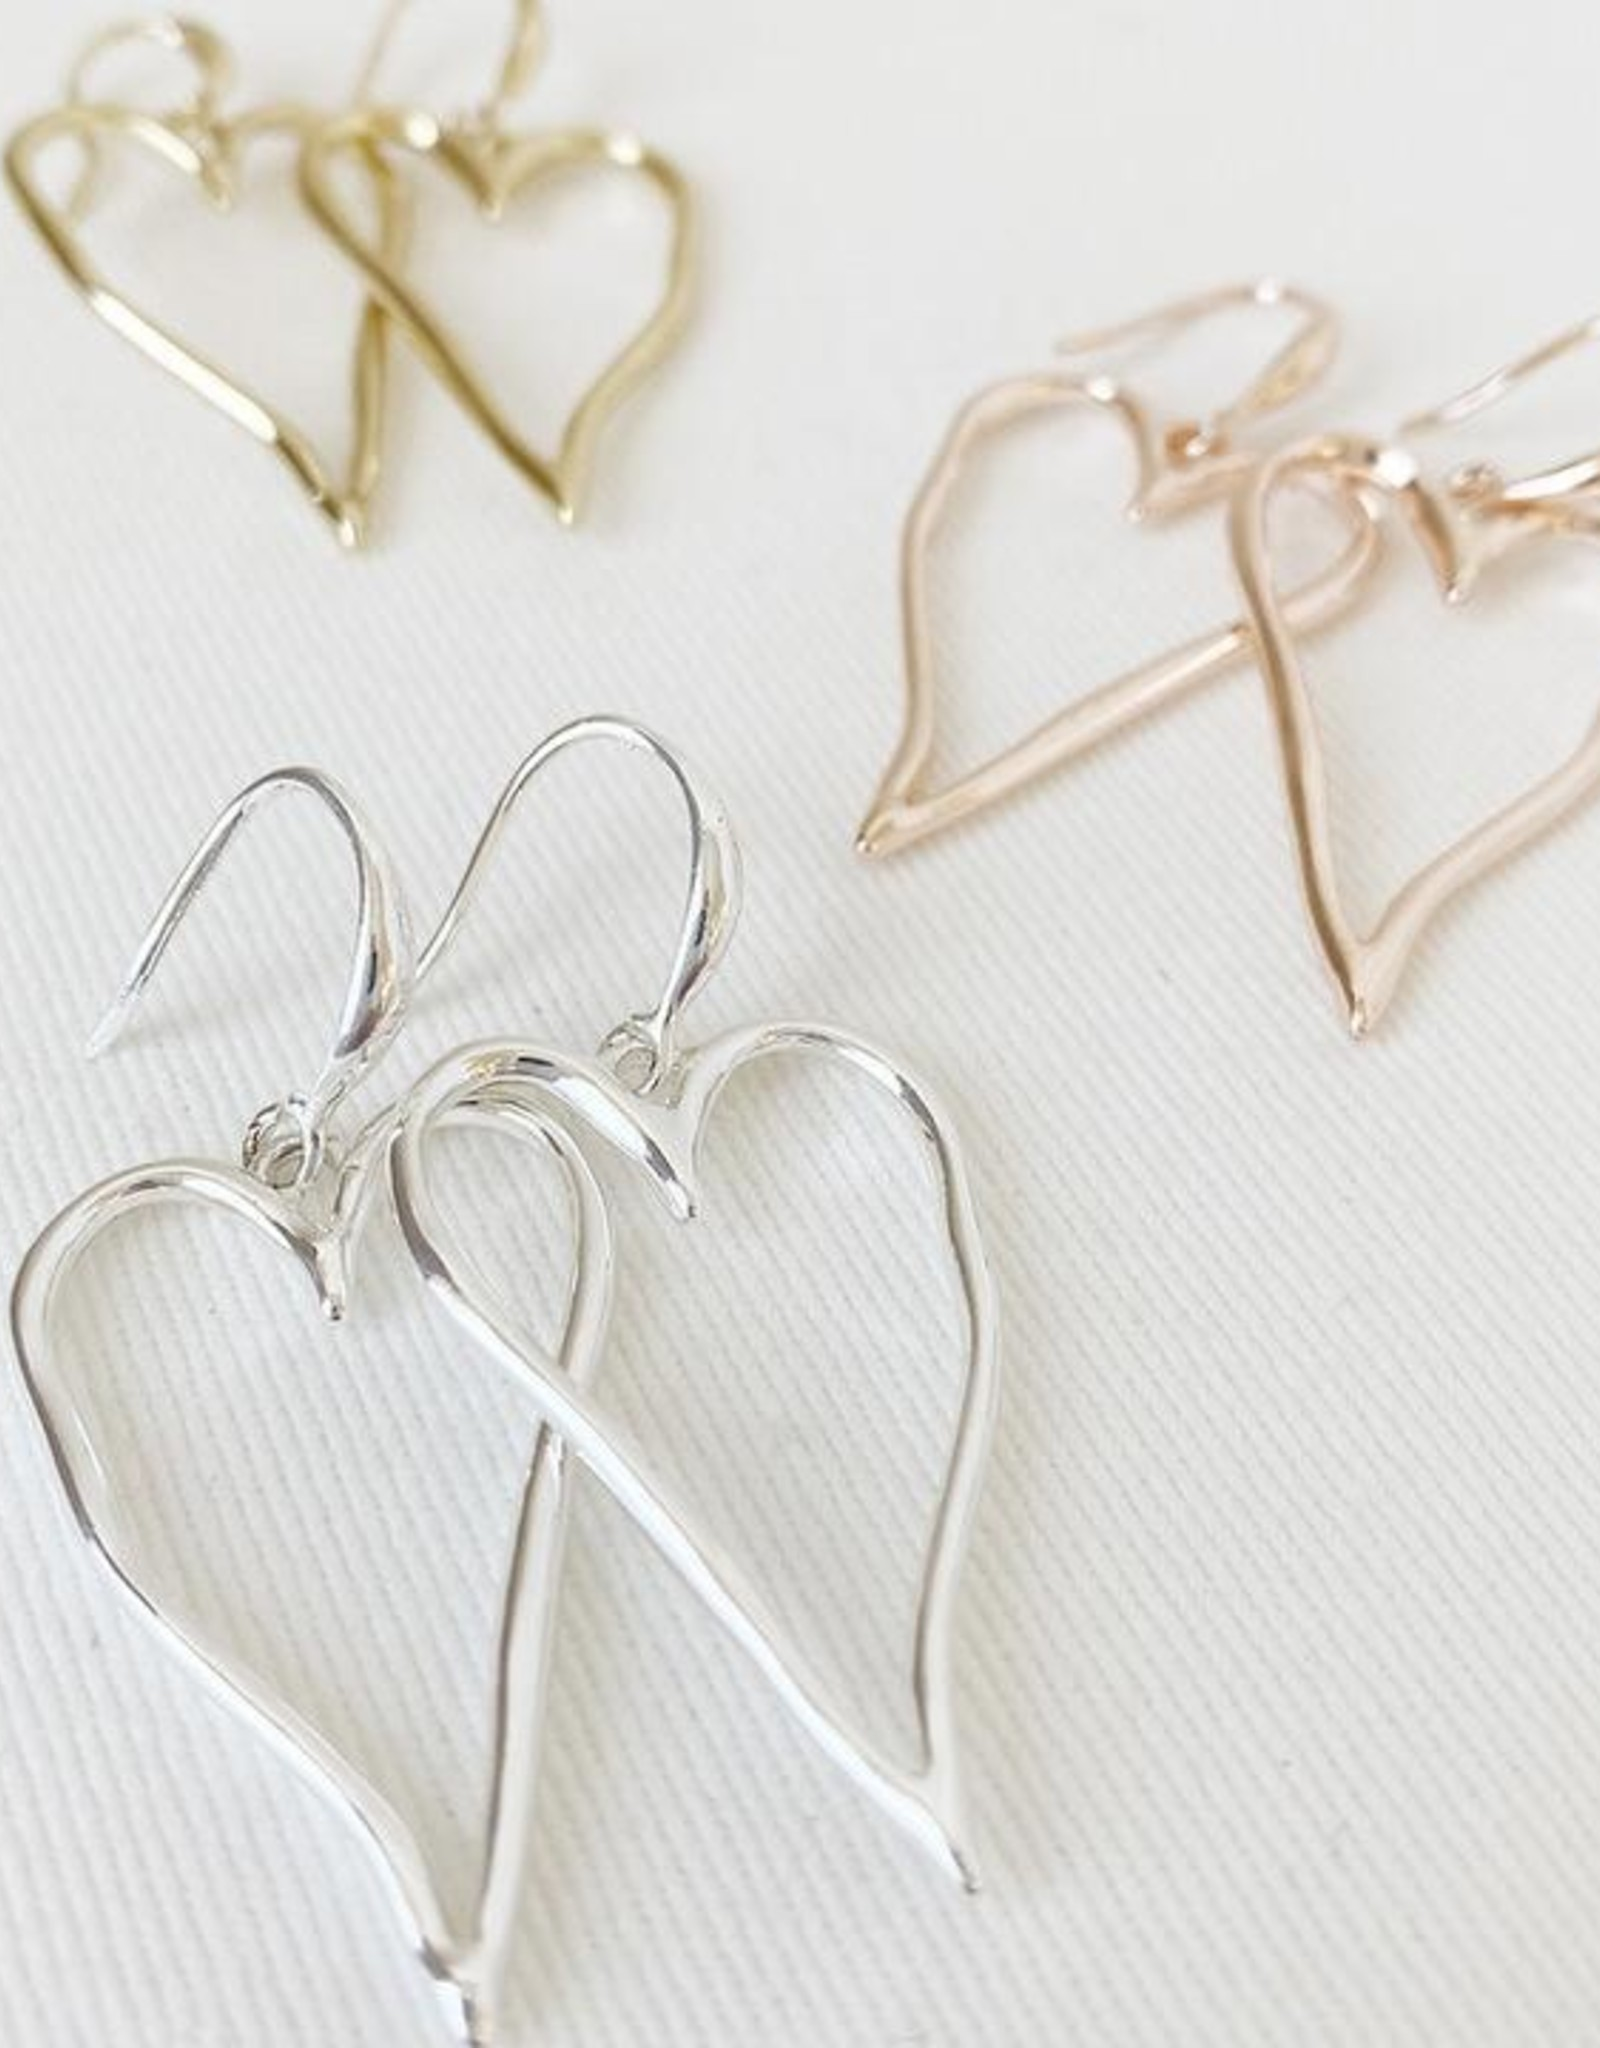 Caracol Caracol 2342 Large Wavy Metallic Heart Drop Earrings